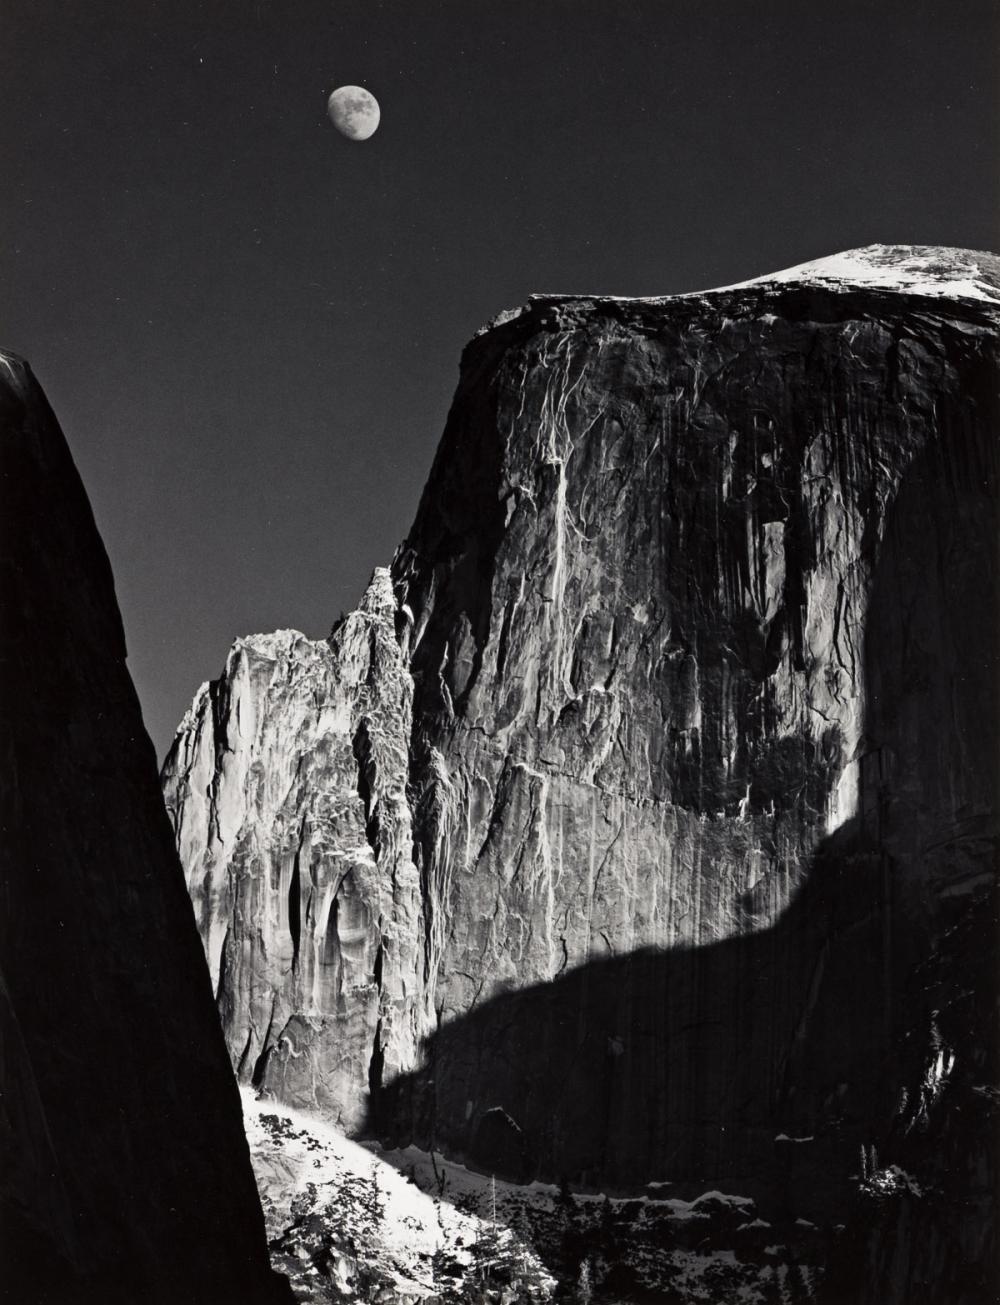 ANSEL ADAMS (1902-1984) Half Dome and Moon.